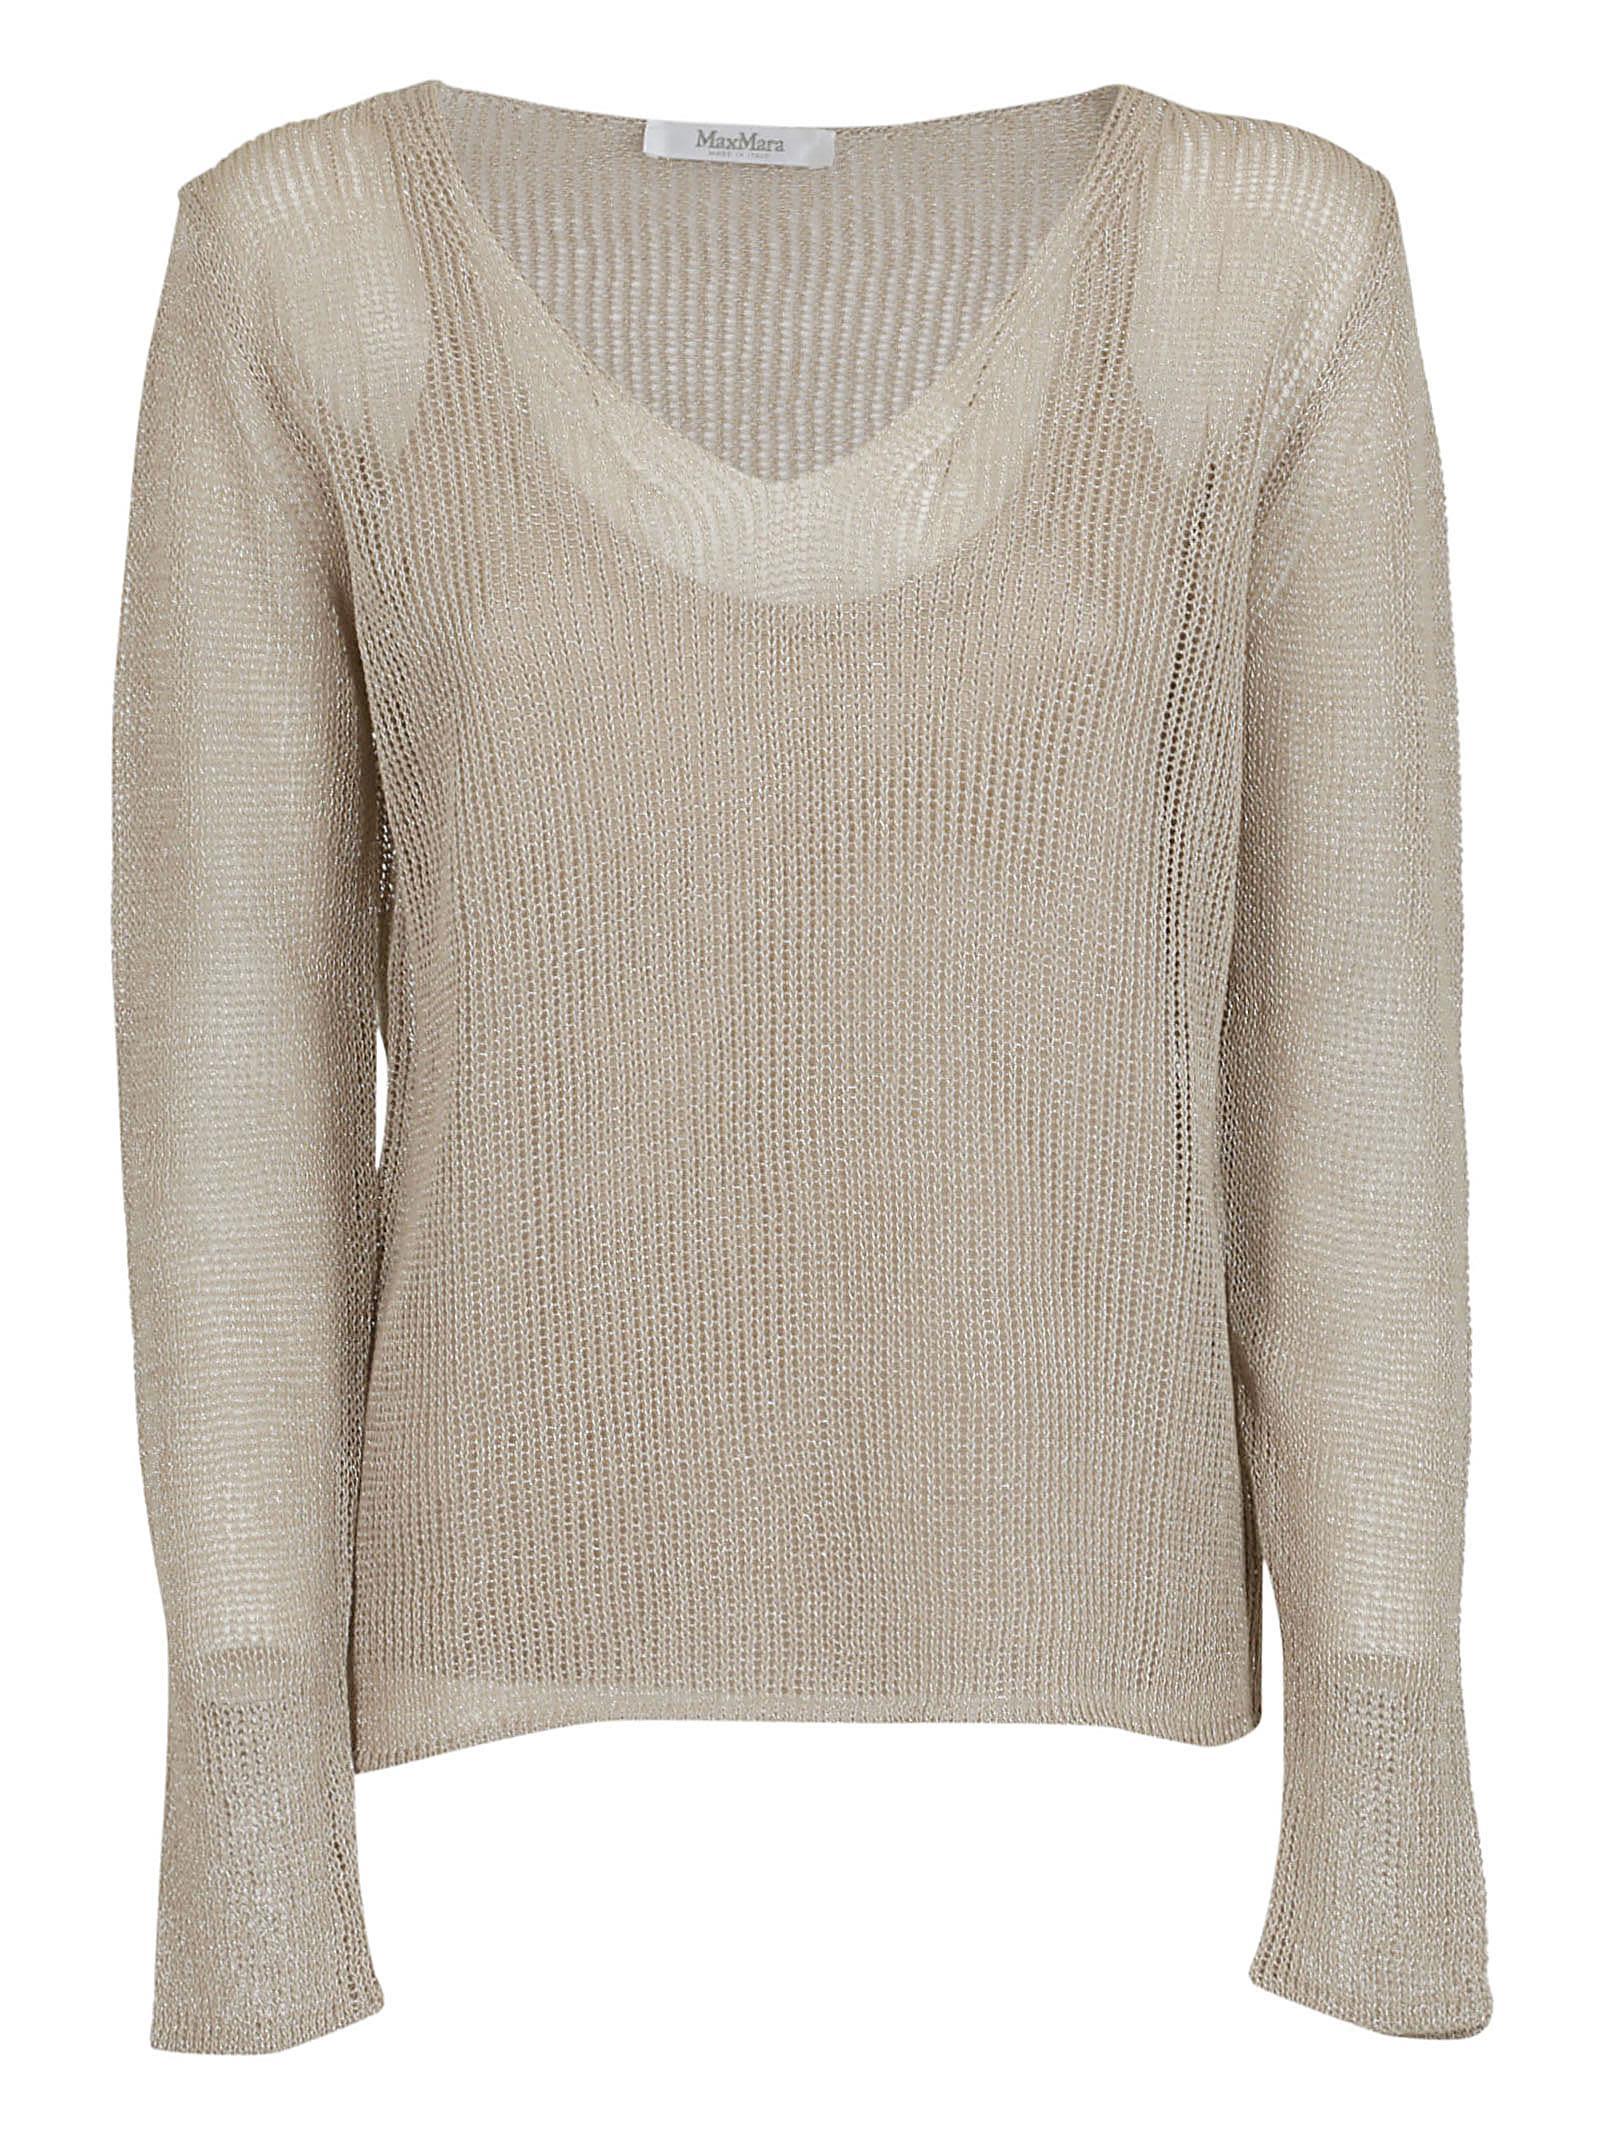 Max Mara Fiumana Sweater